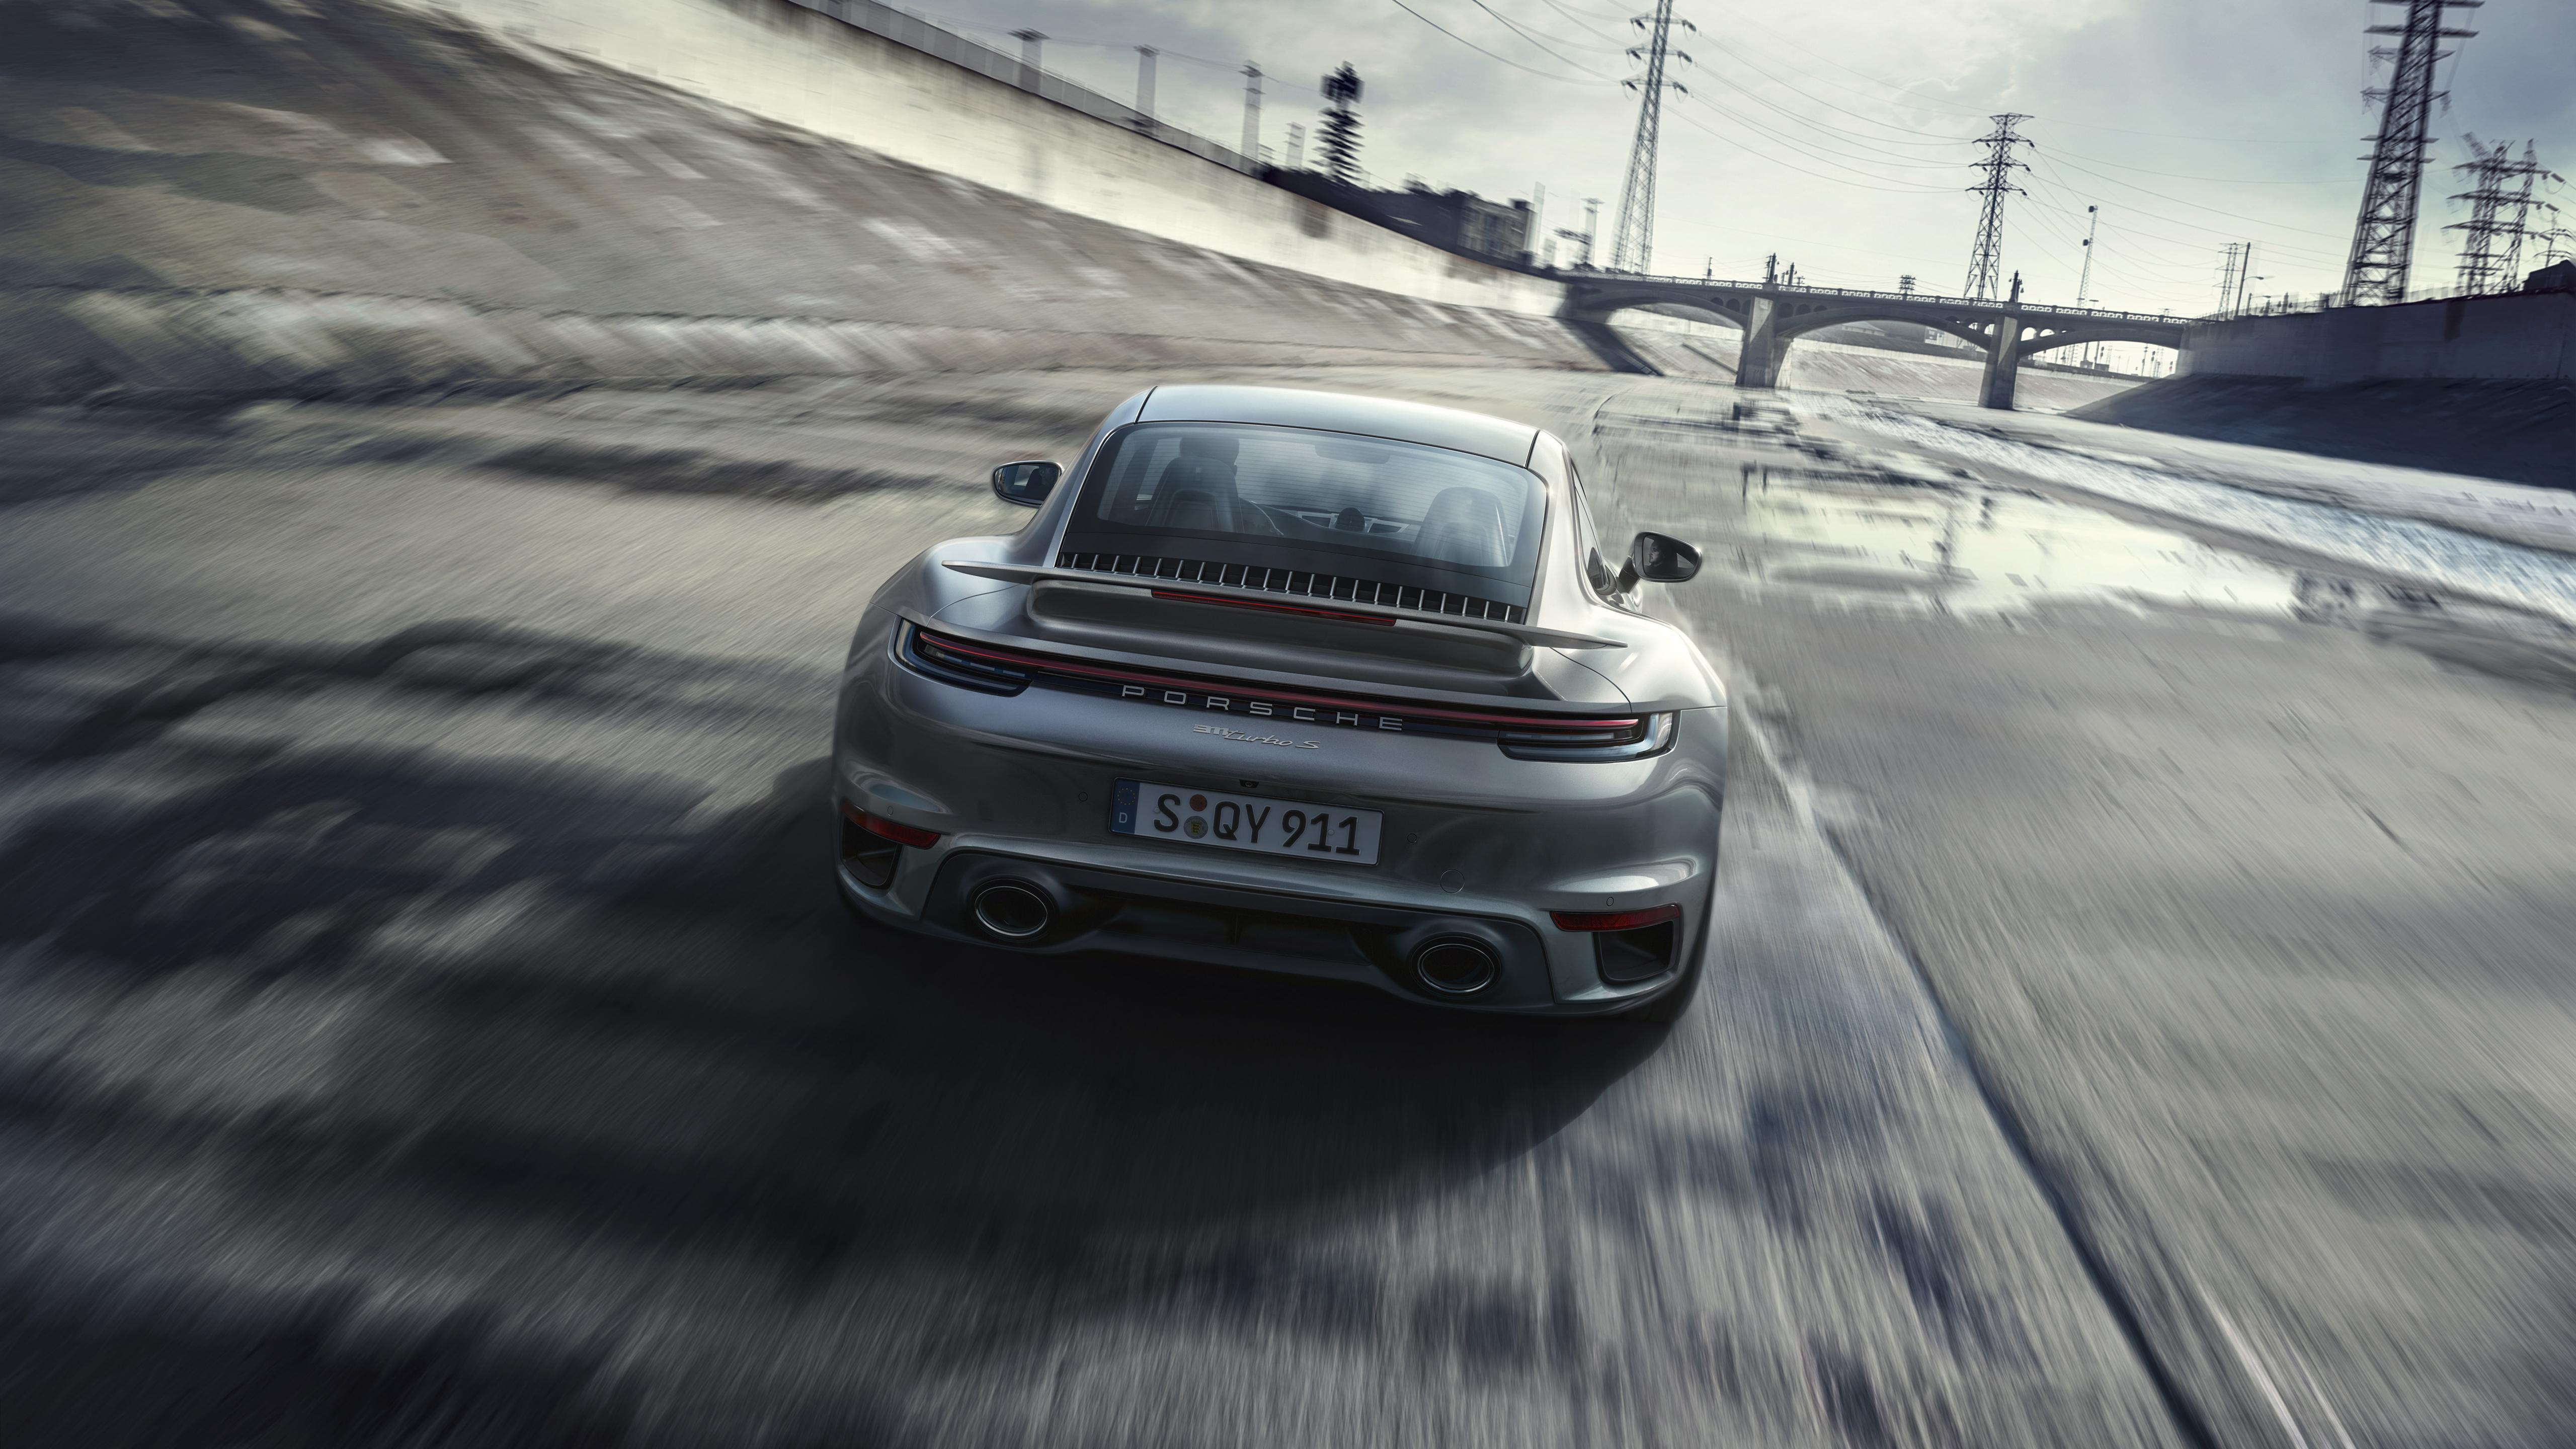 Porsche 911 Turbo S 2020 5k 7 Wallpaper Hd Car Wallpapers Id 14591